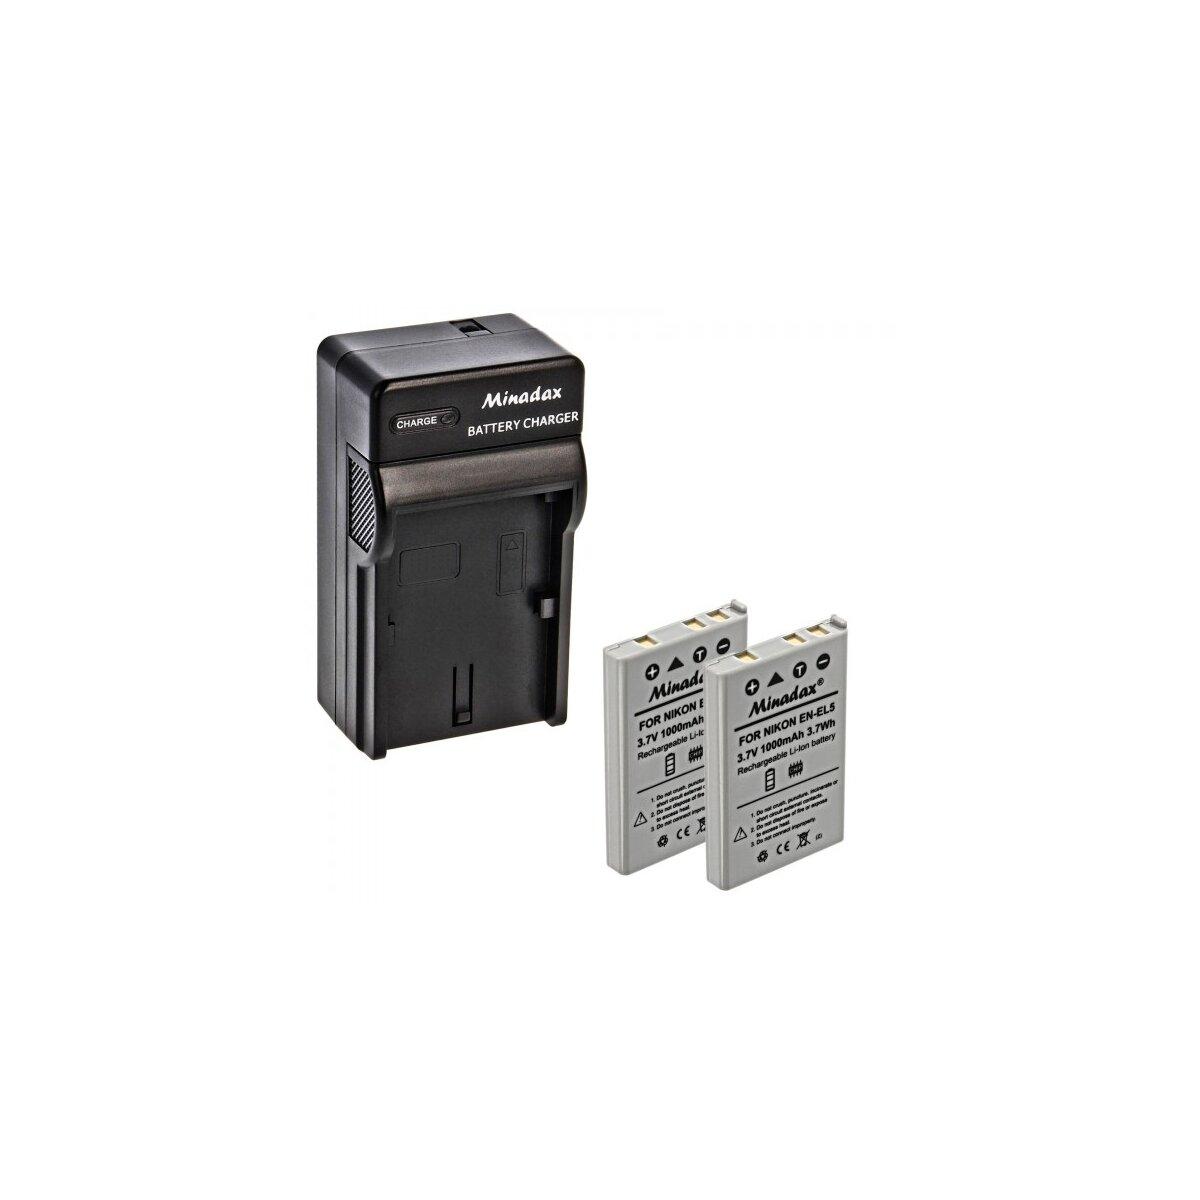 Minadax® Ladegerät 100% kompatibel mit Nikon EN-EL5 inkl. Auto Ladekabel, Ladeschale austauschbar + 2x Akku Ersatz für EN-EL5